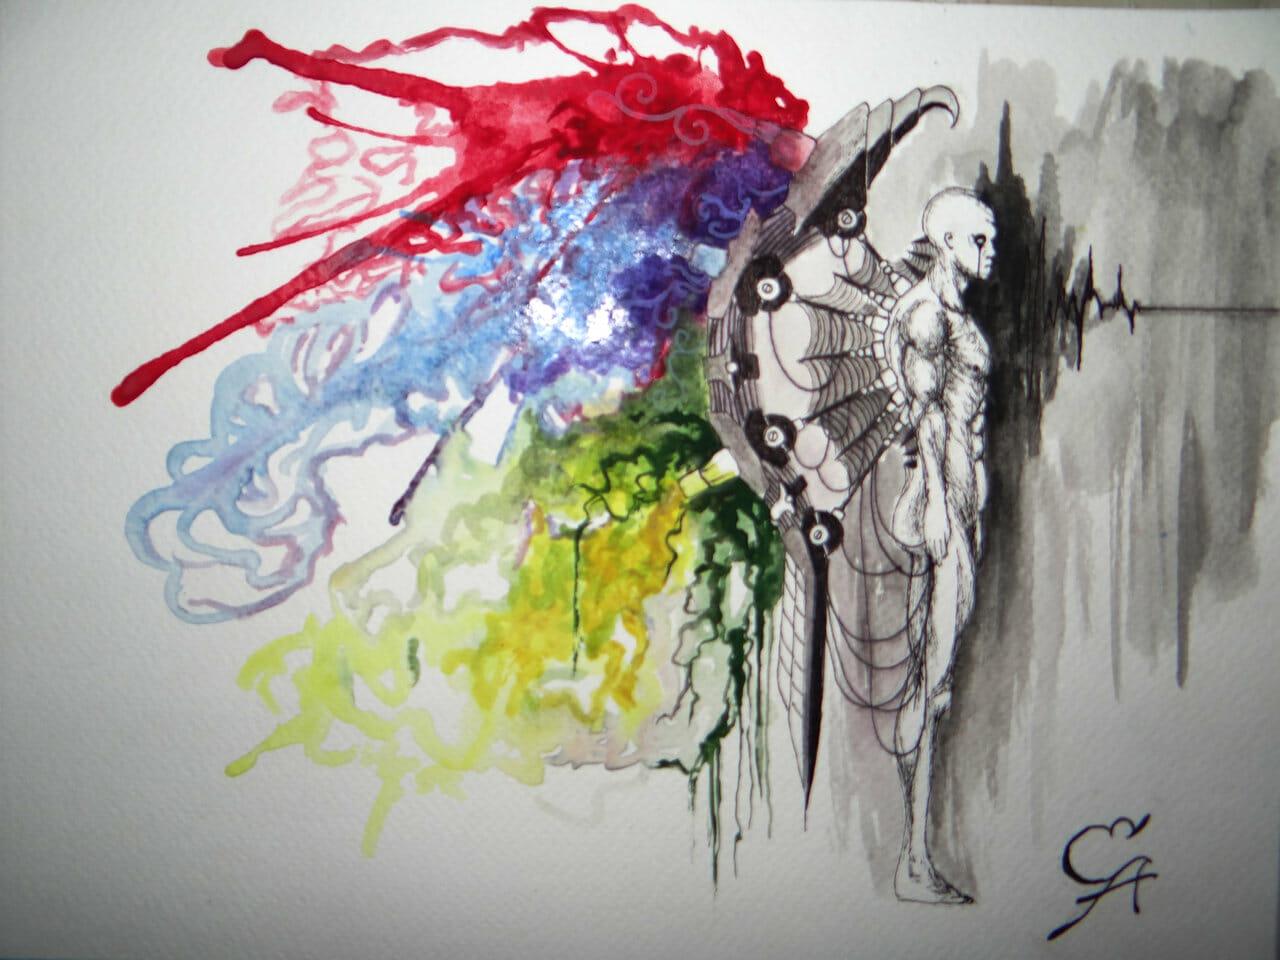 unknown beauty of creativity by pauloavida dyxlv